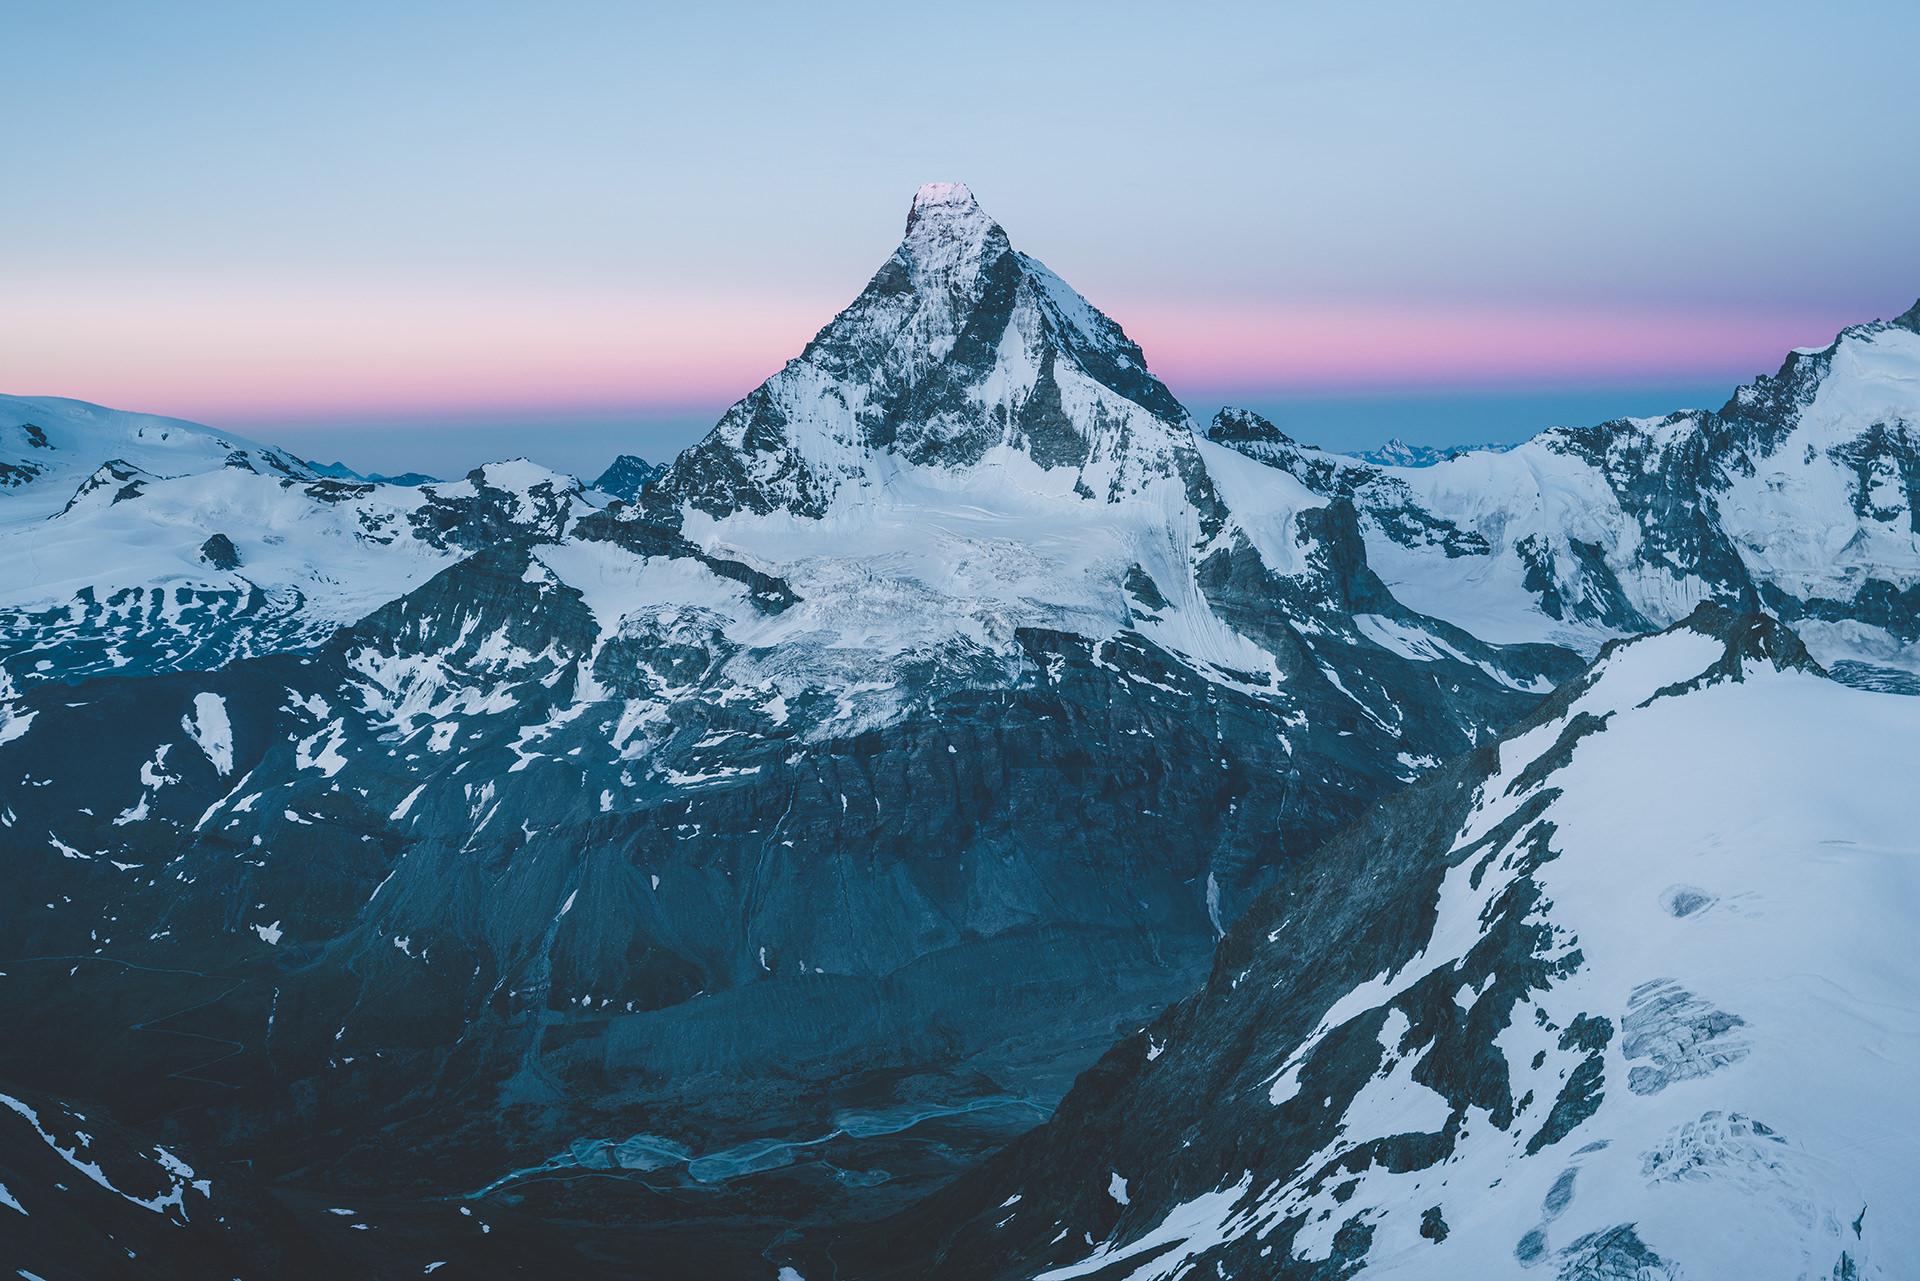 morgenstimmung-berge-gipfelblick-himmel-ruhe